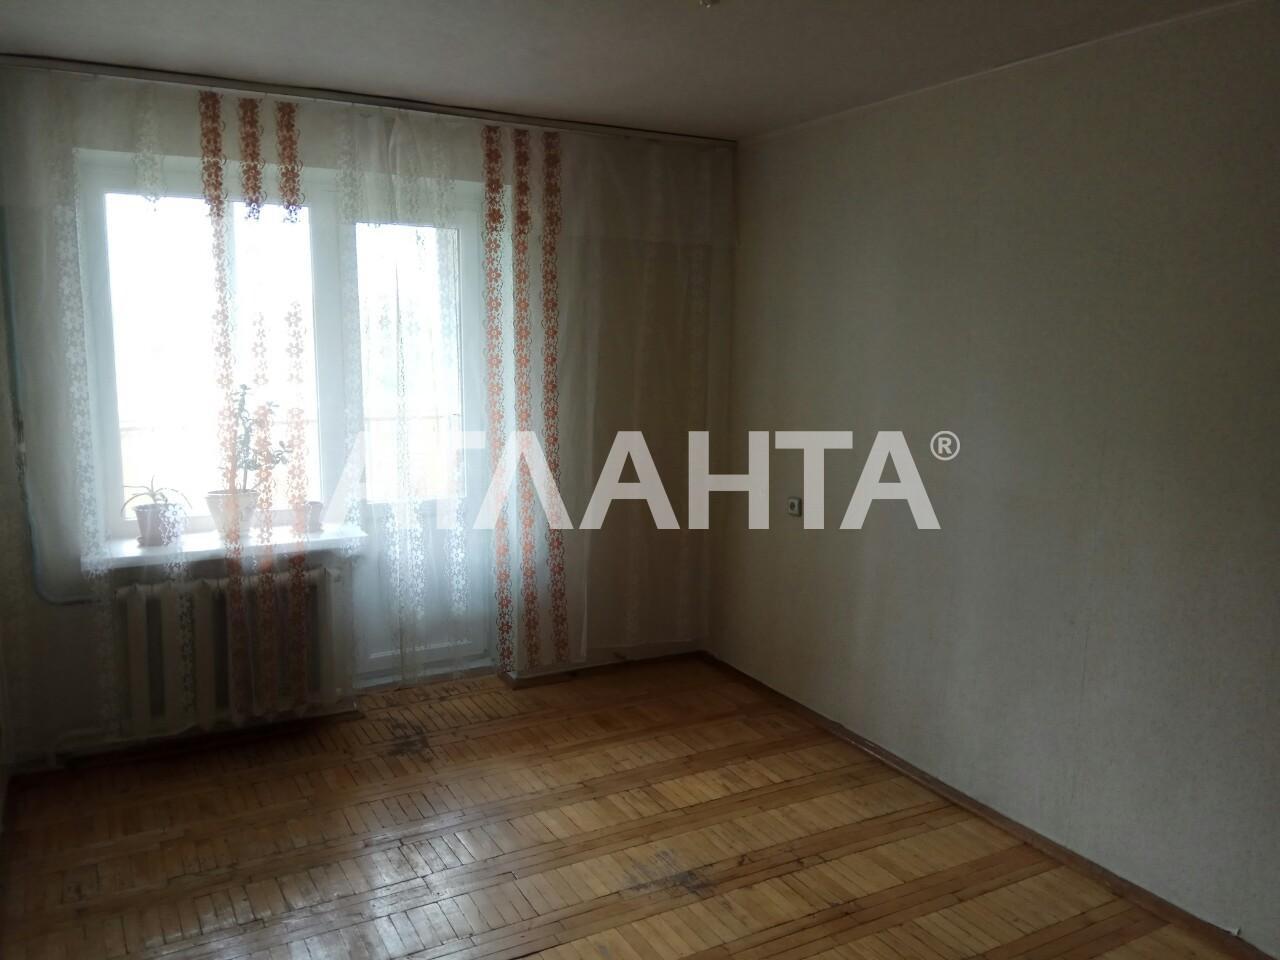 Продается 3-комнатная Квартира на ул. Ул. Заболотного — 58 500 у.е. (фото №3)